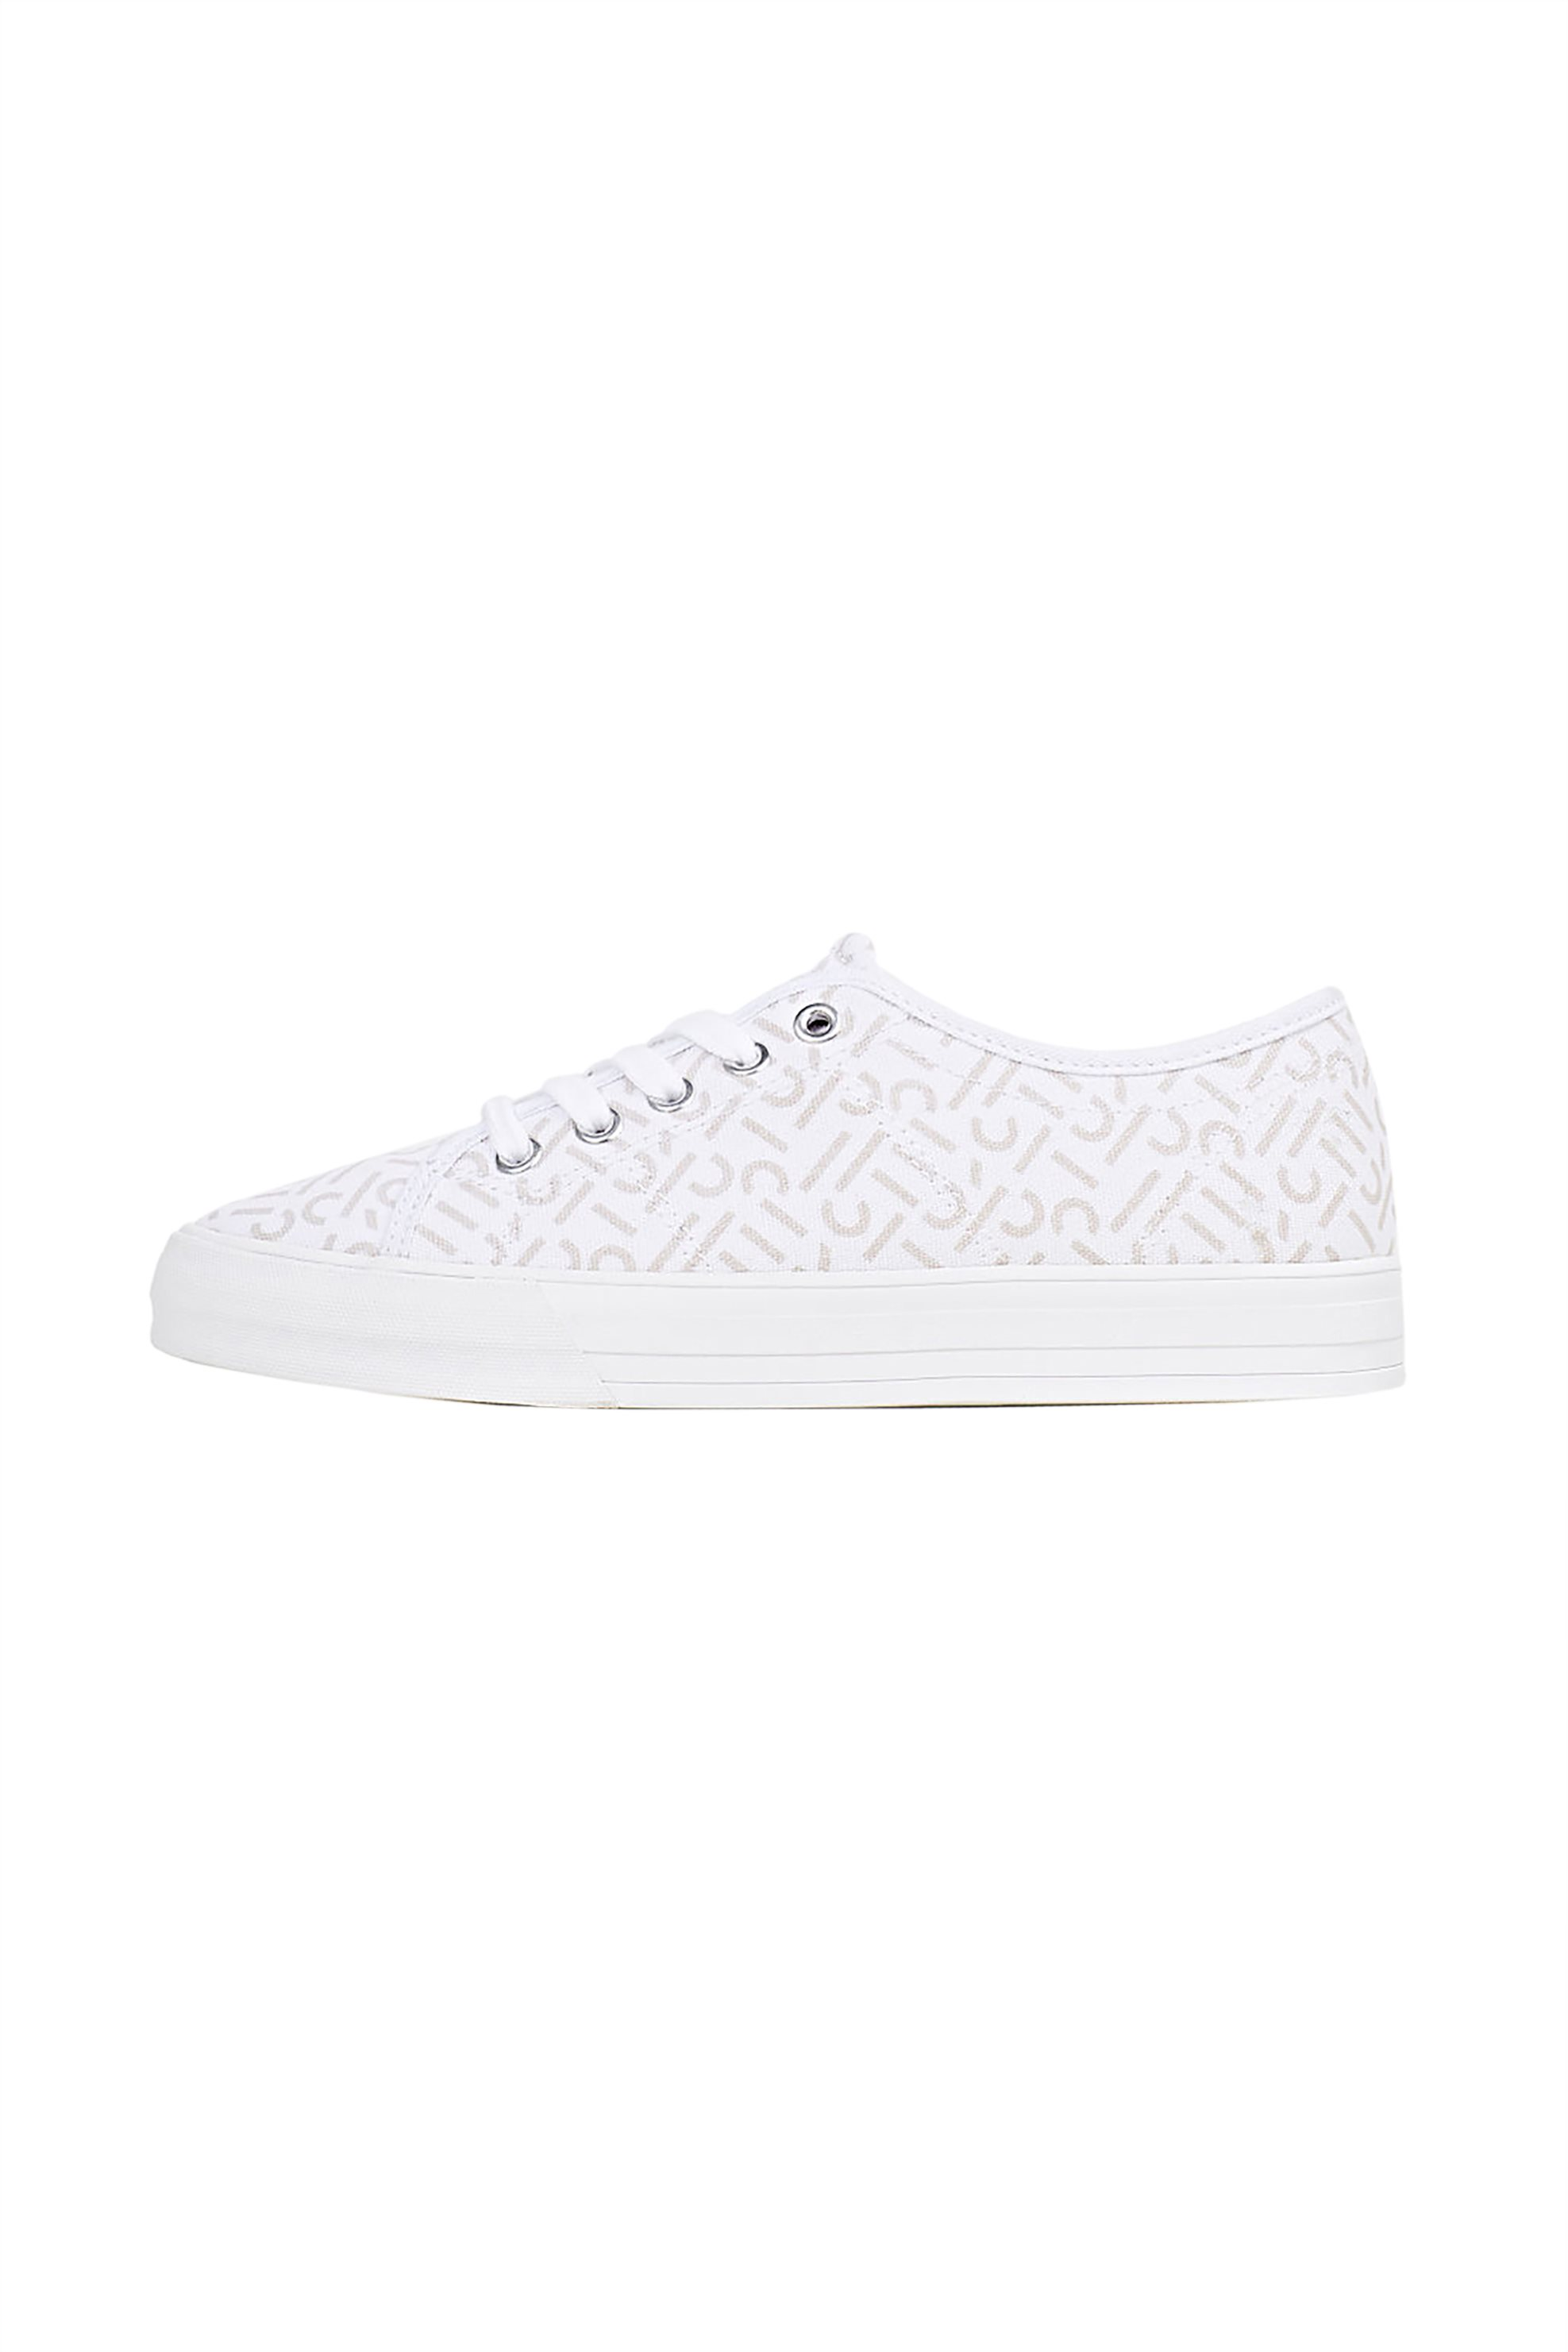 Esprit γυναικέια πάνινα sneakers με all-over logo print – 040EK1W329 – Λευκό